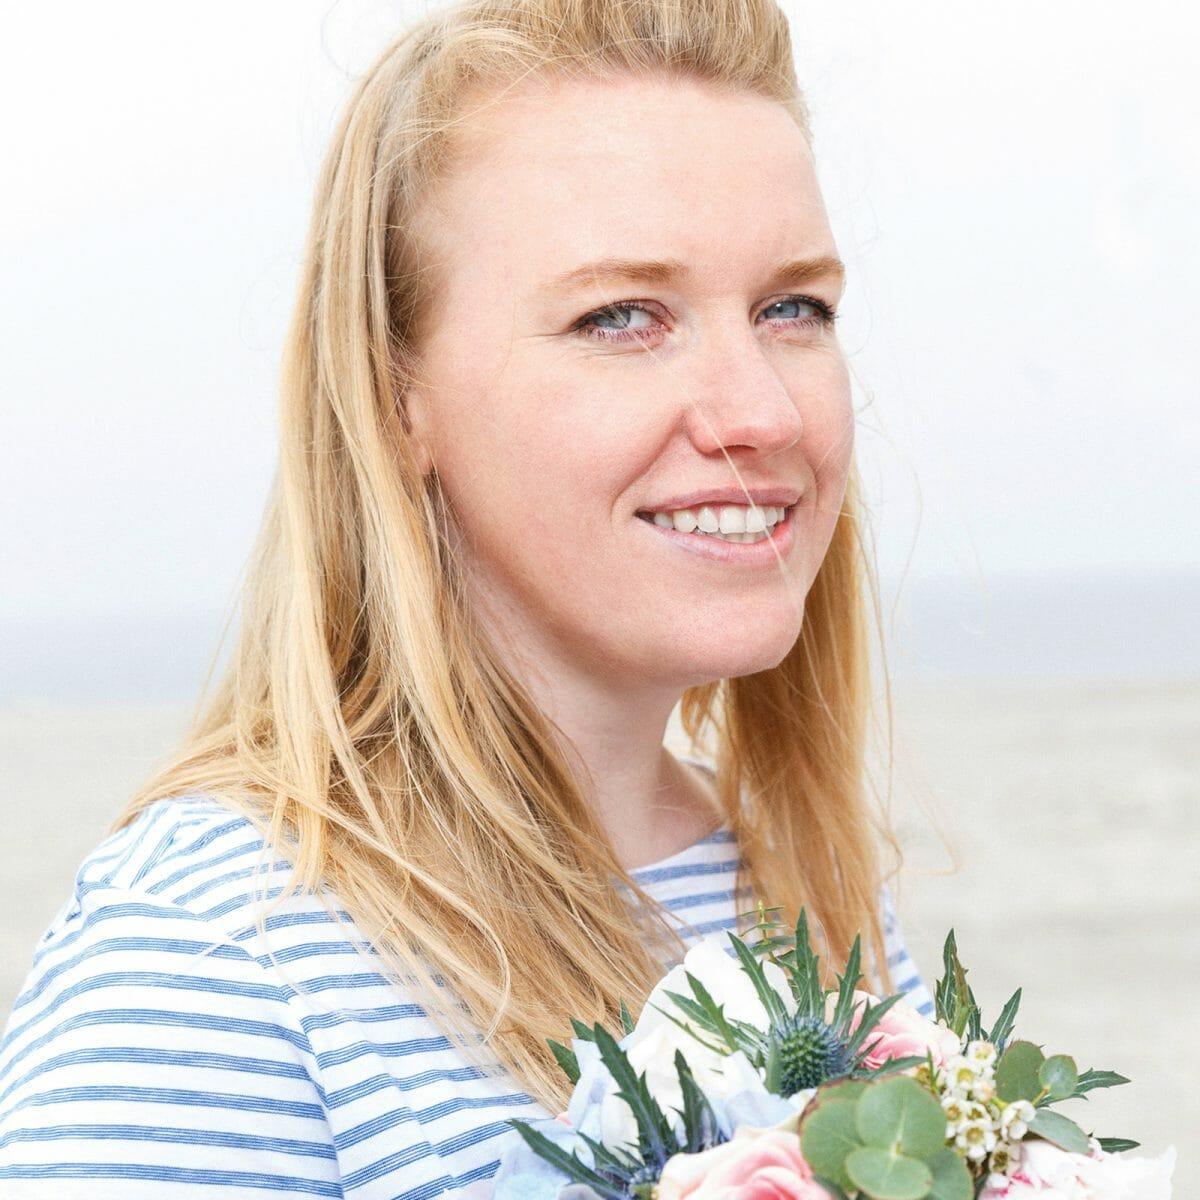 Porträtfoto der Norderneyer Blumenhändlerin Antje Boekhoff